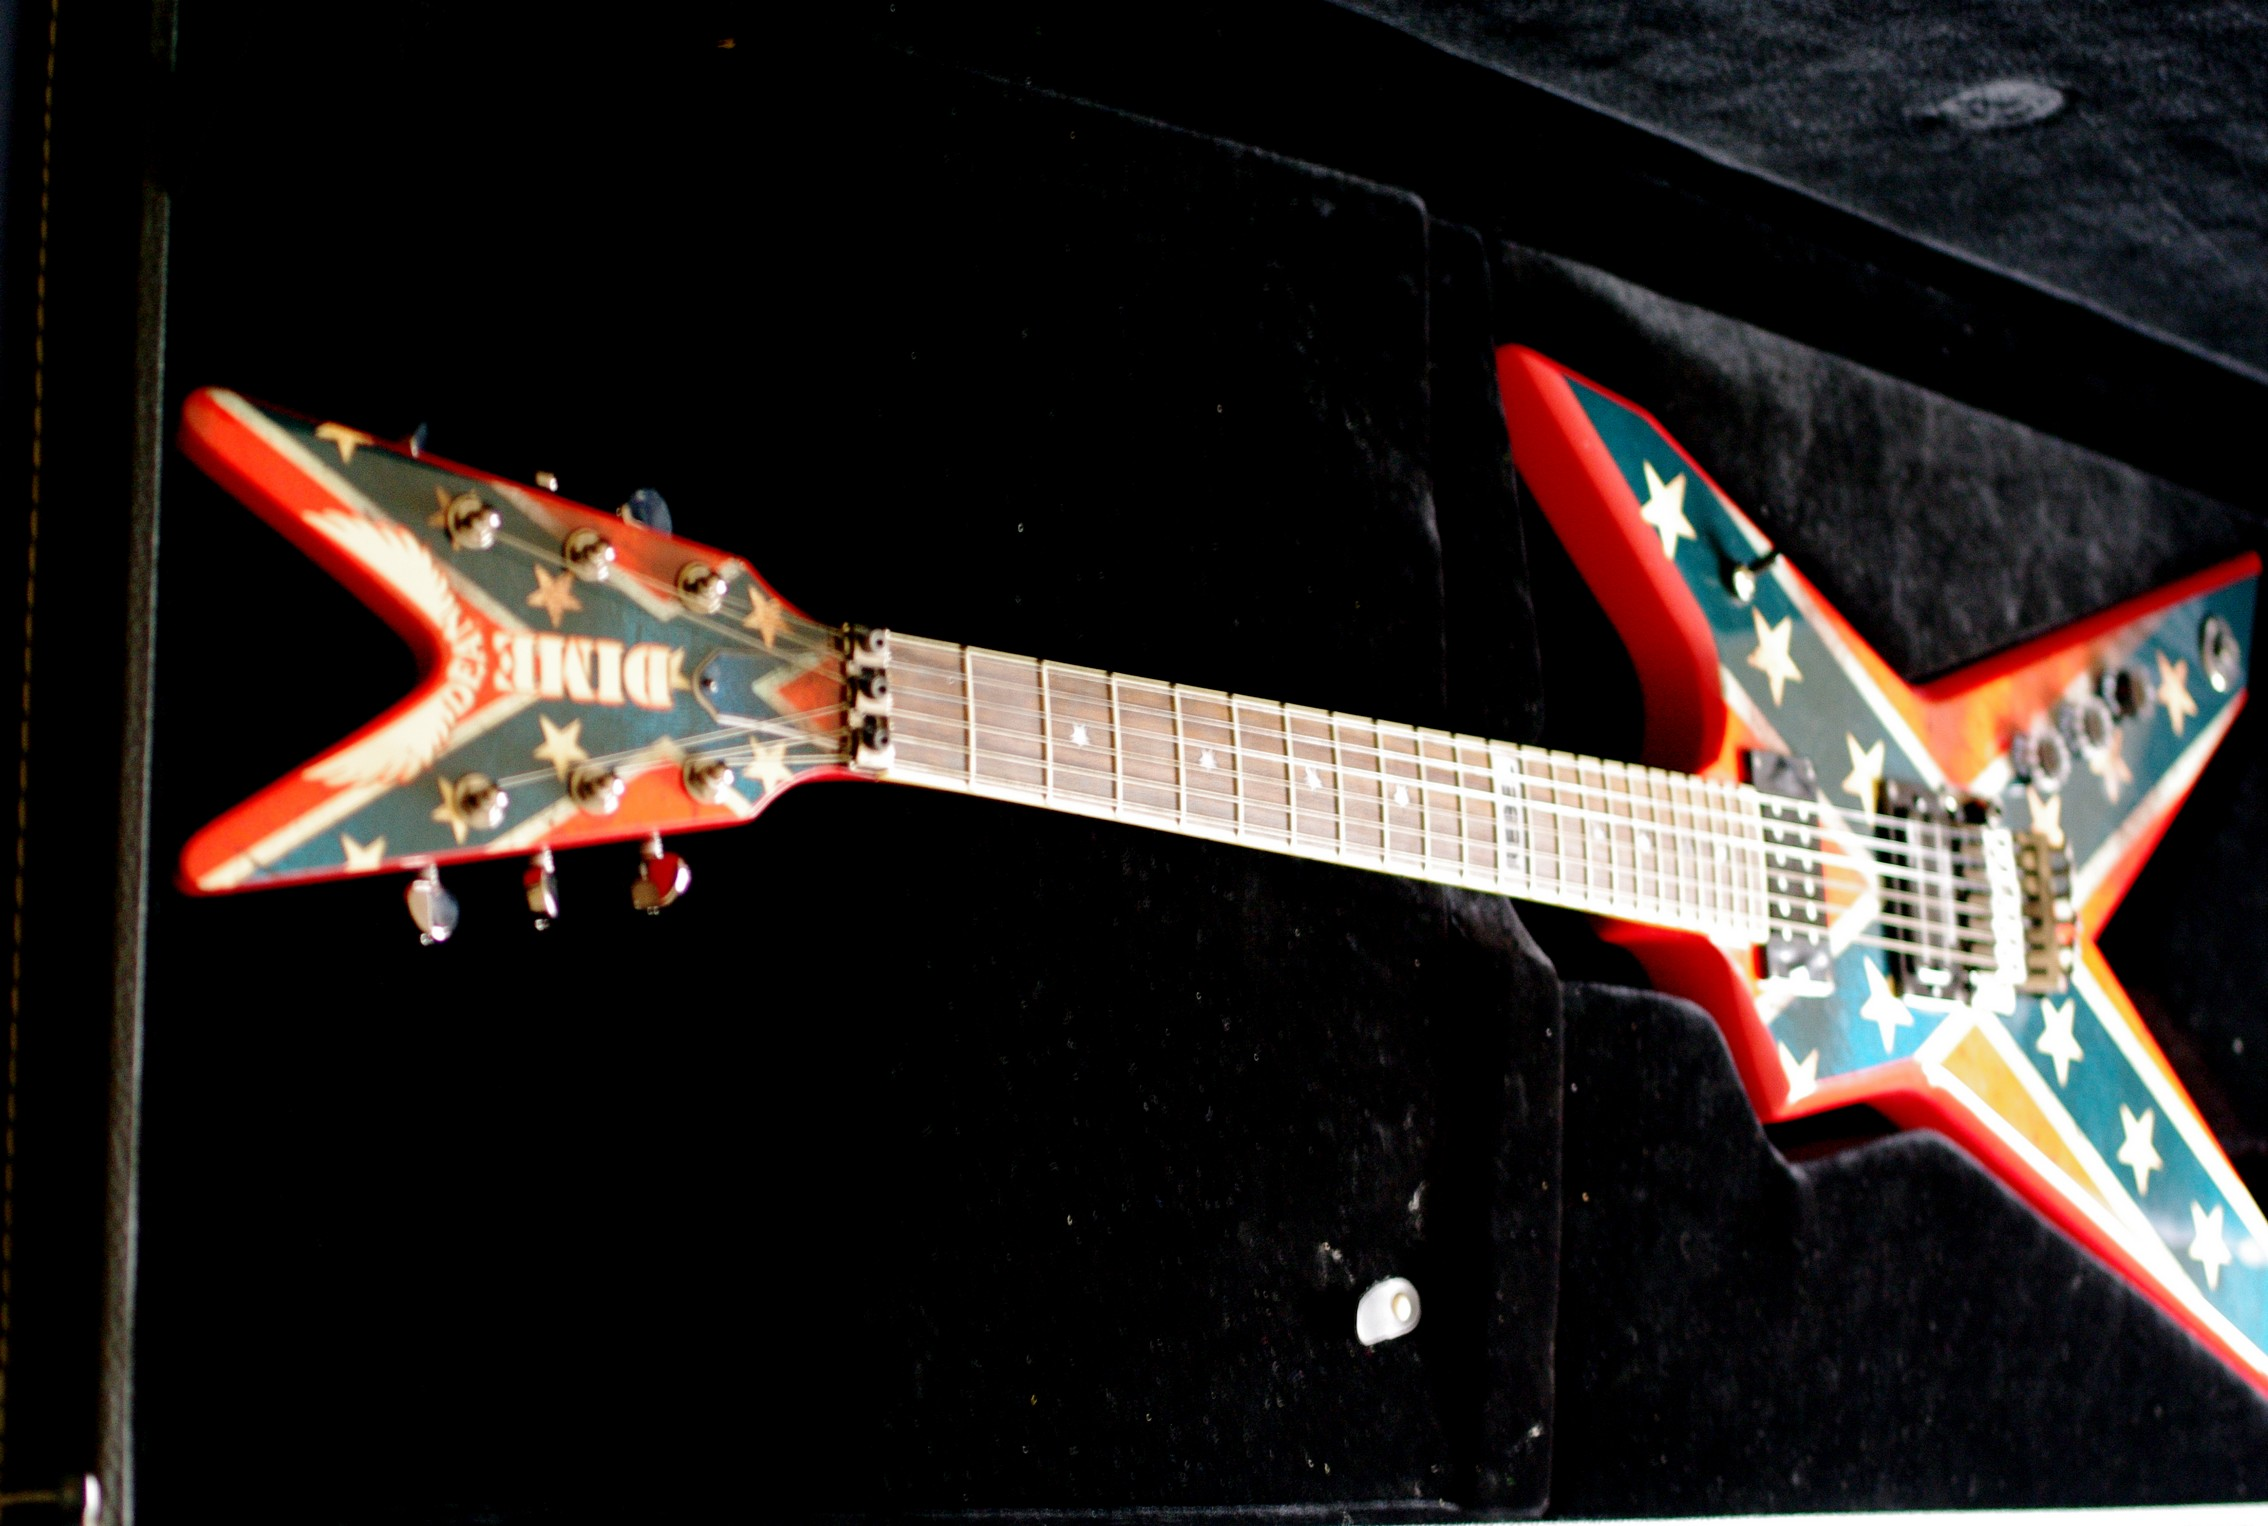 dean guitars dimebag dixie rebel image 562903 audiofanzine. Black Bedroom Furniture Sets. Home Design Ideas